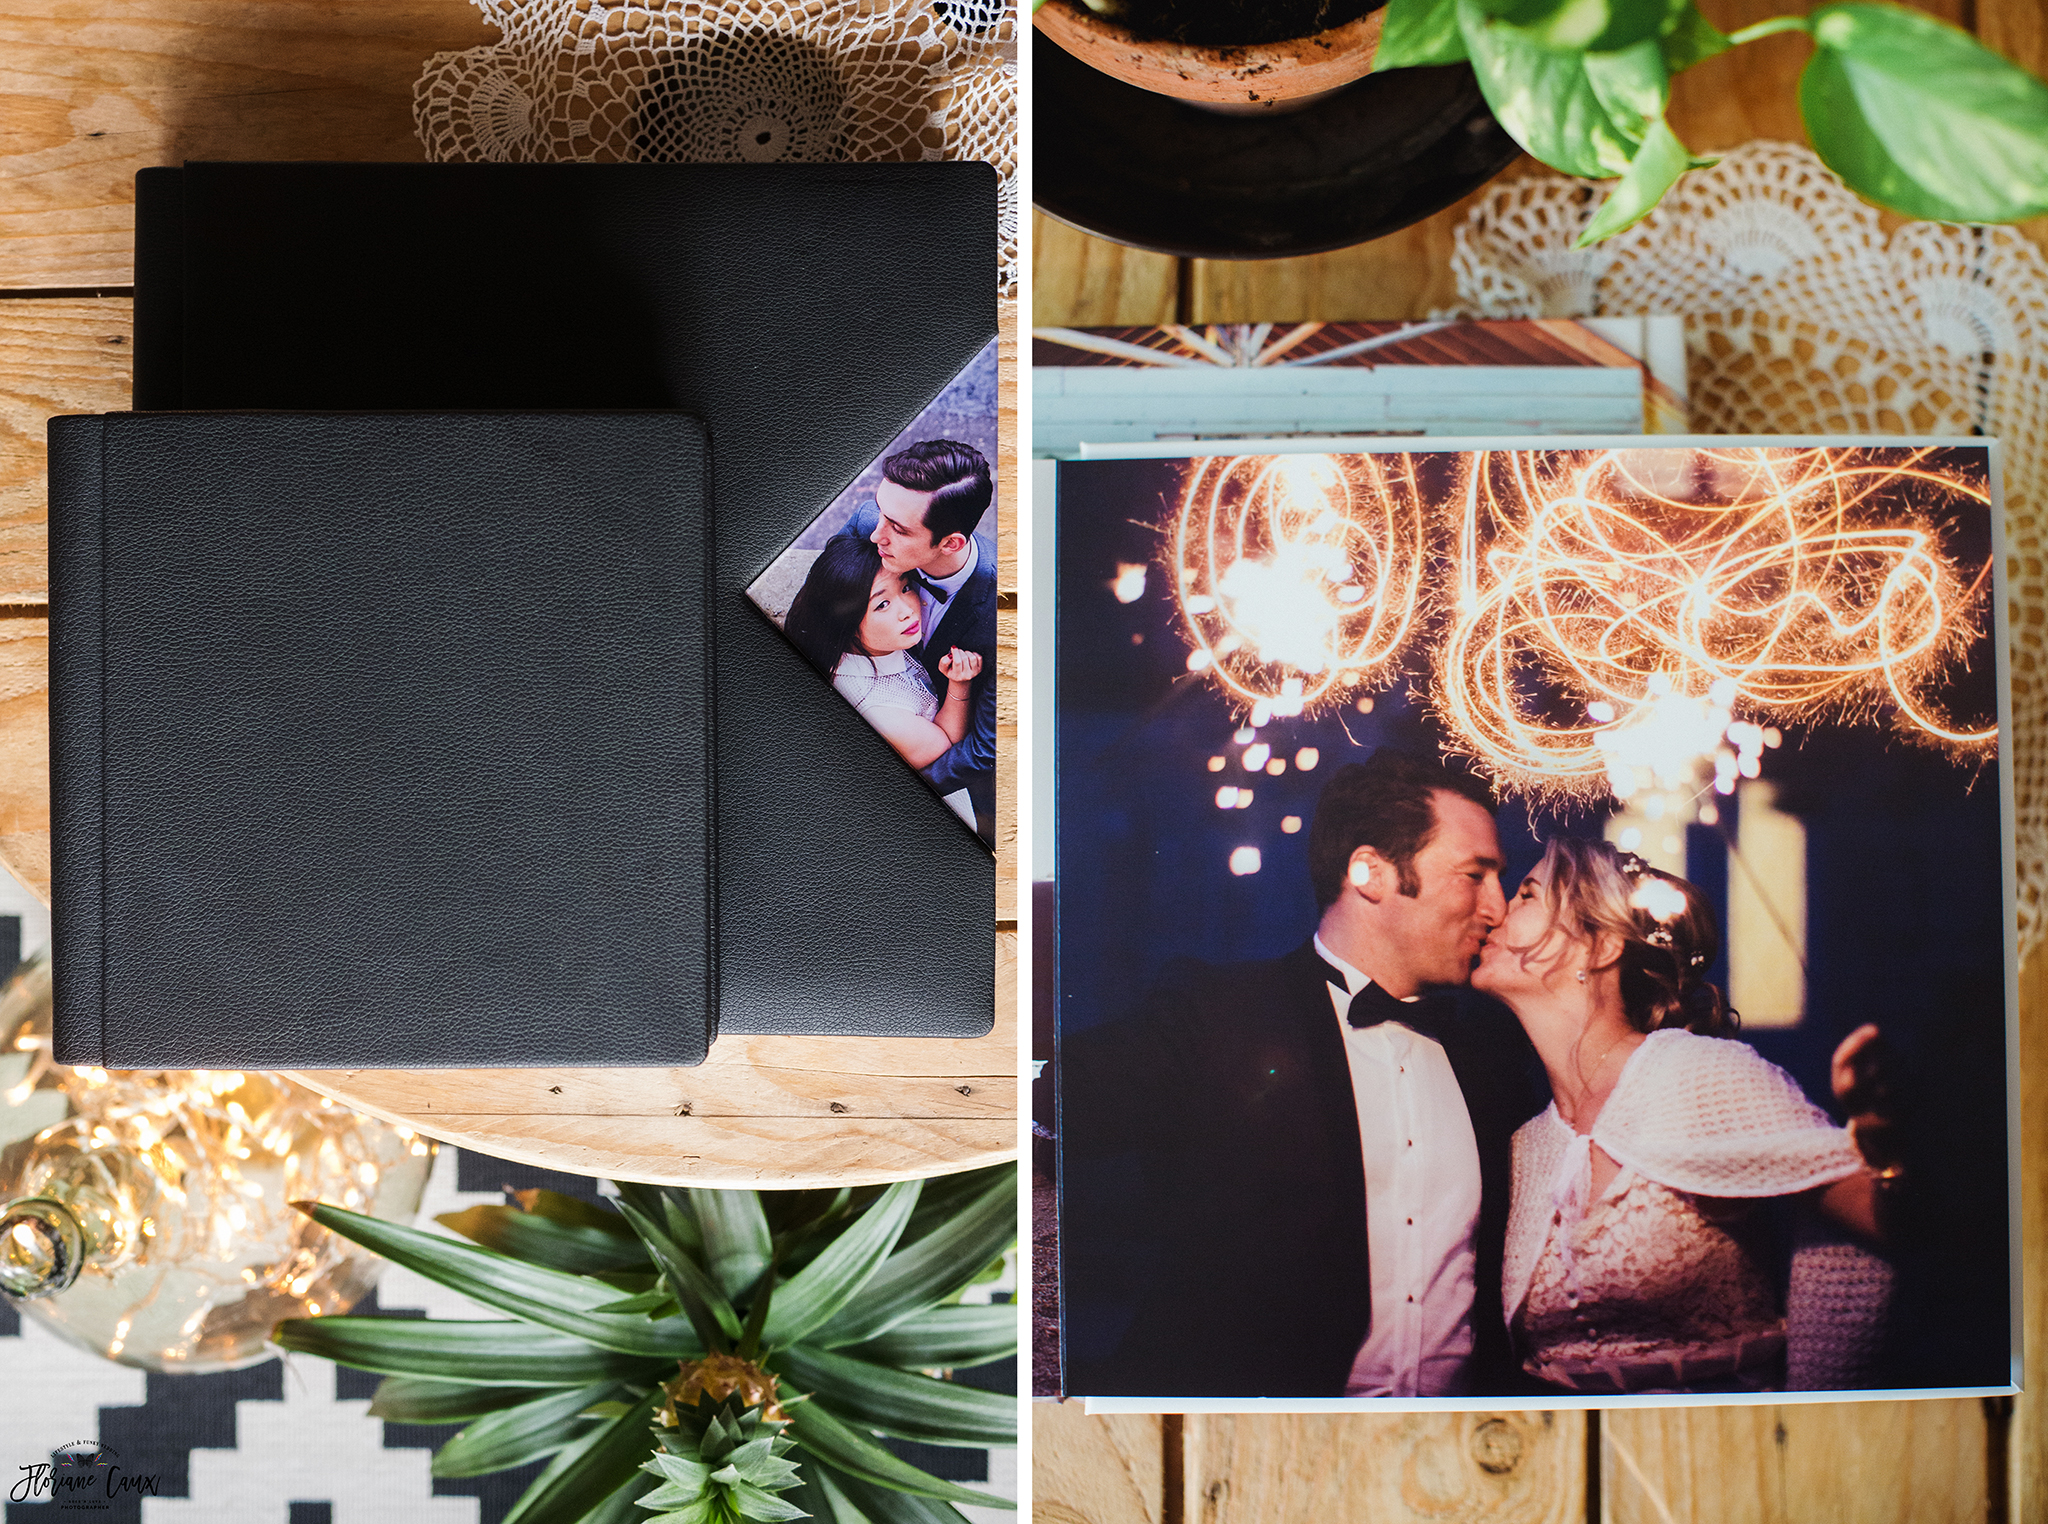 album-photo-professionnel-photographe-mariage